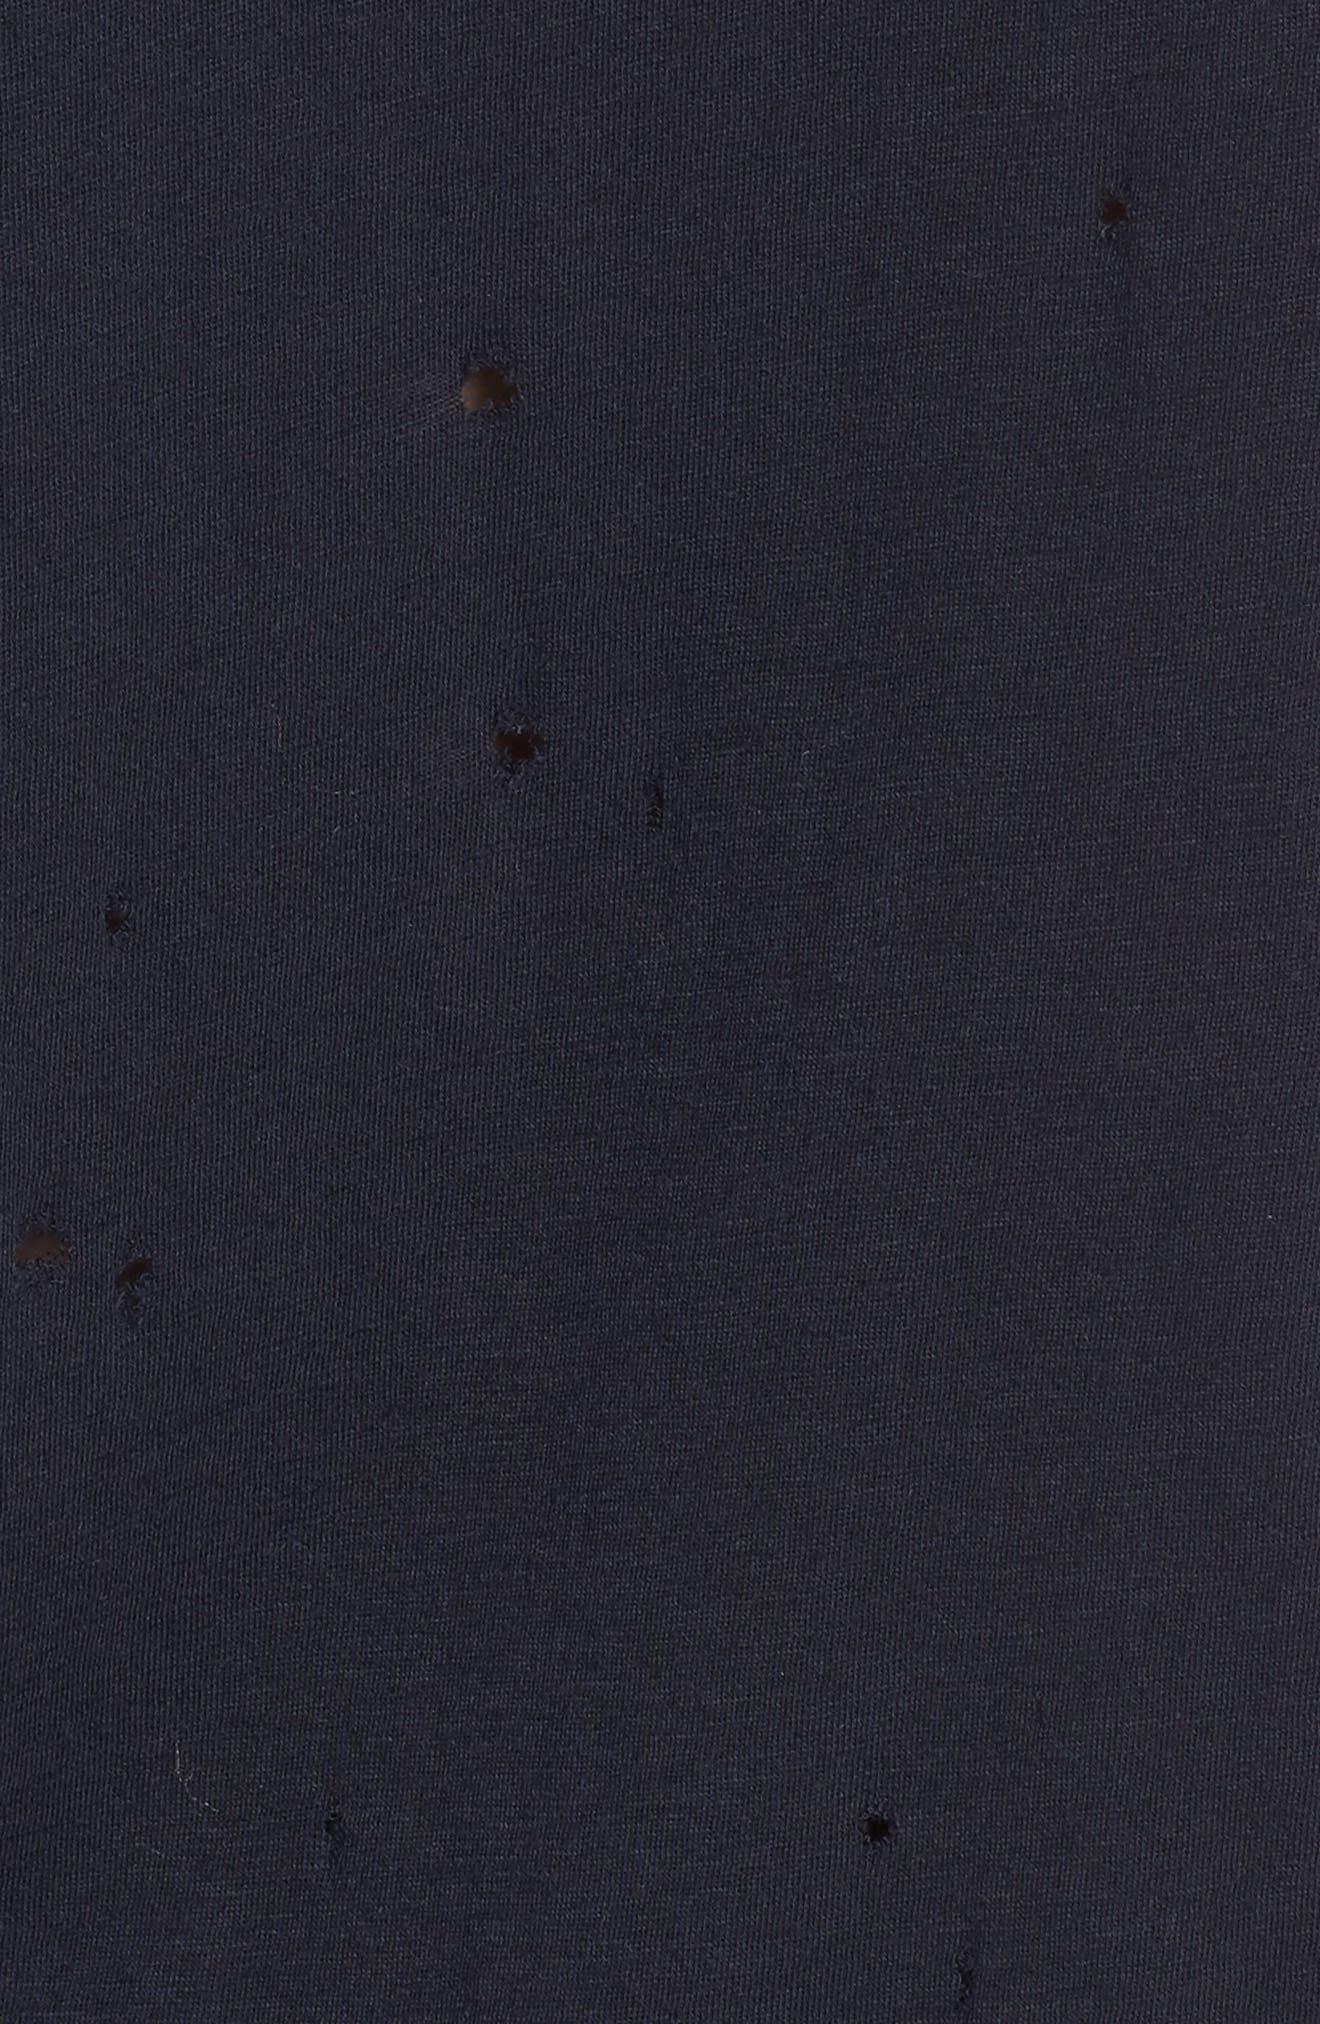 'Wassa' Destroyed V-Neck Tee,                             Alternate thumbnail 5, color,                             400